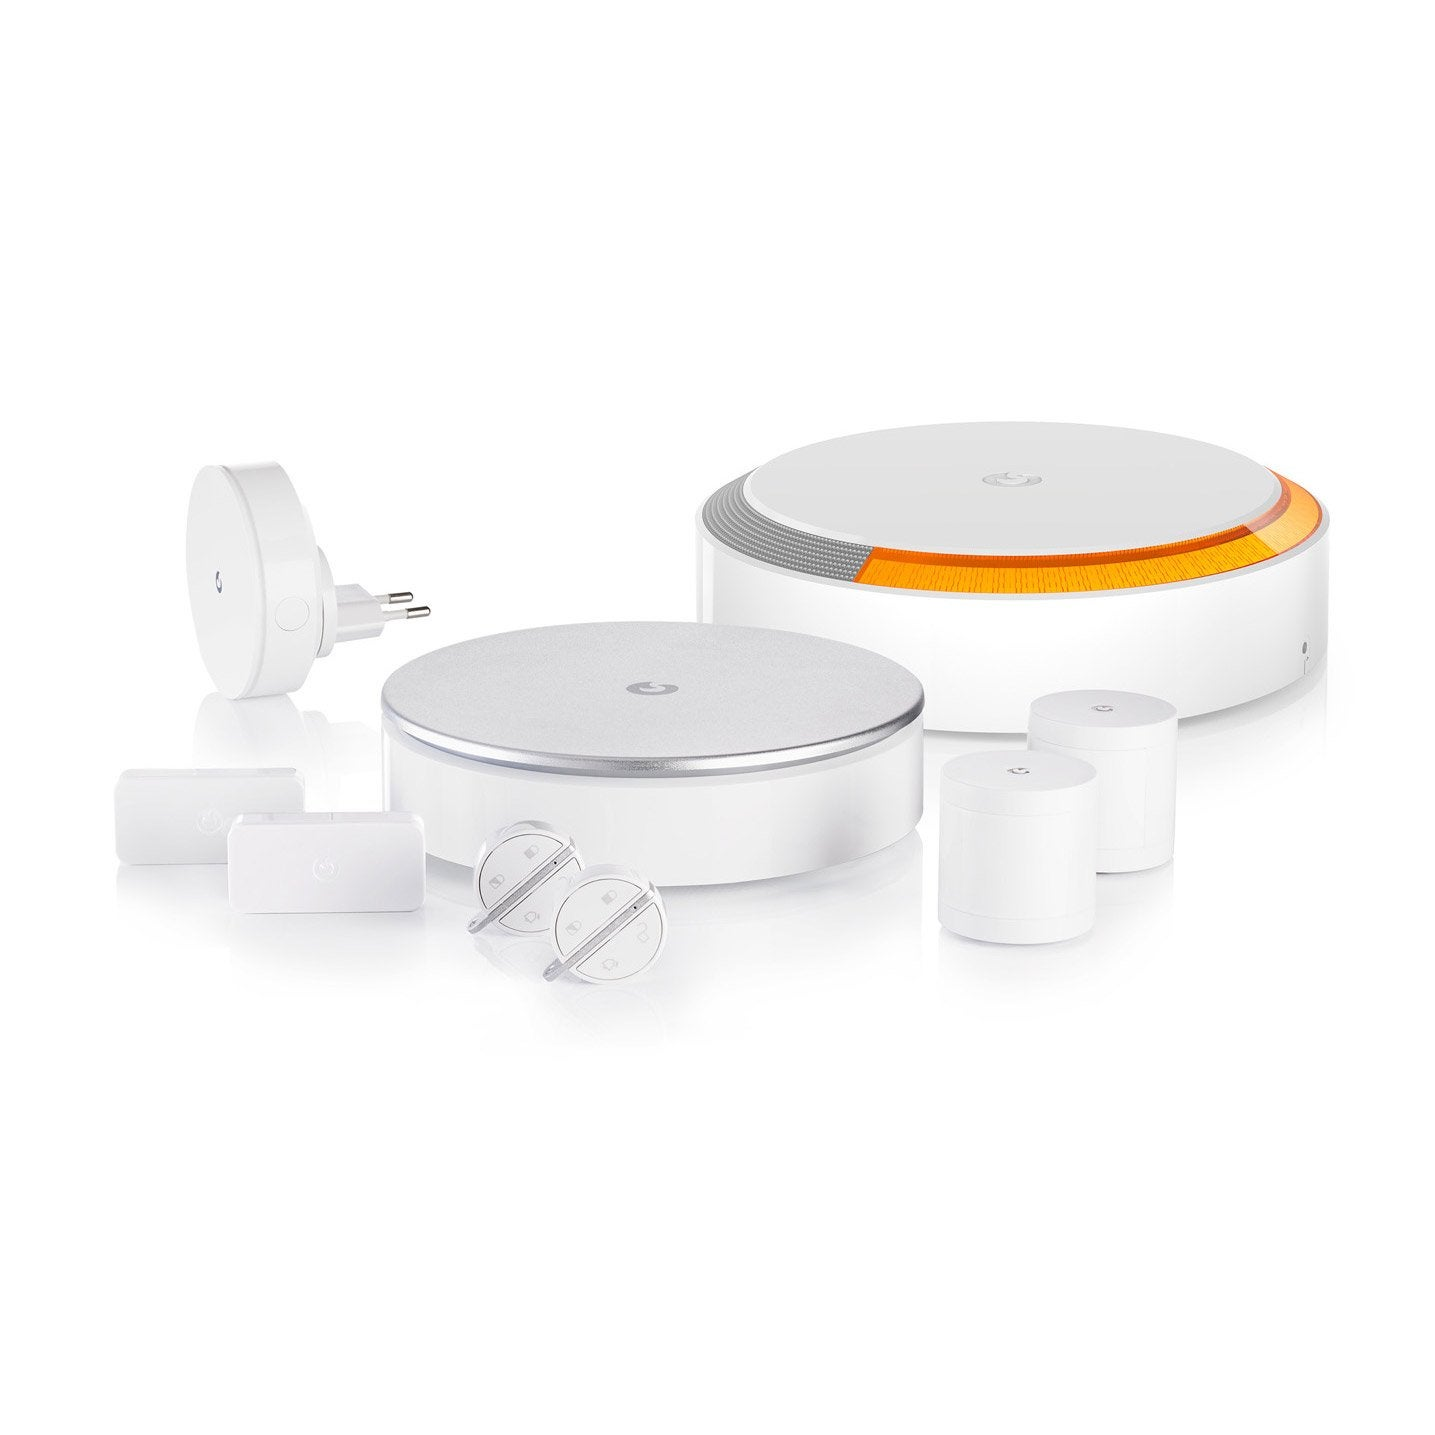 Merveilleux Alarme Maison Sans Fil Connectée Home Alarm Xl MYFOX ...